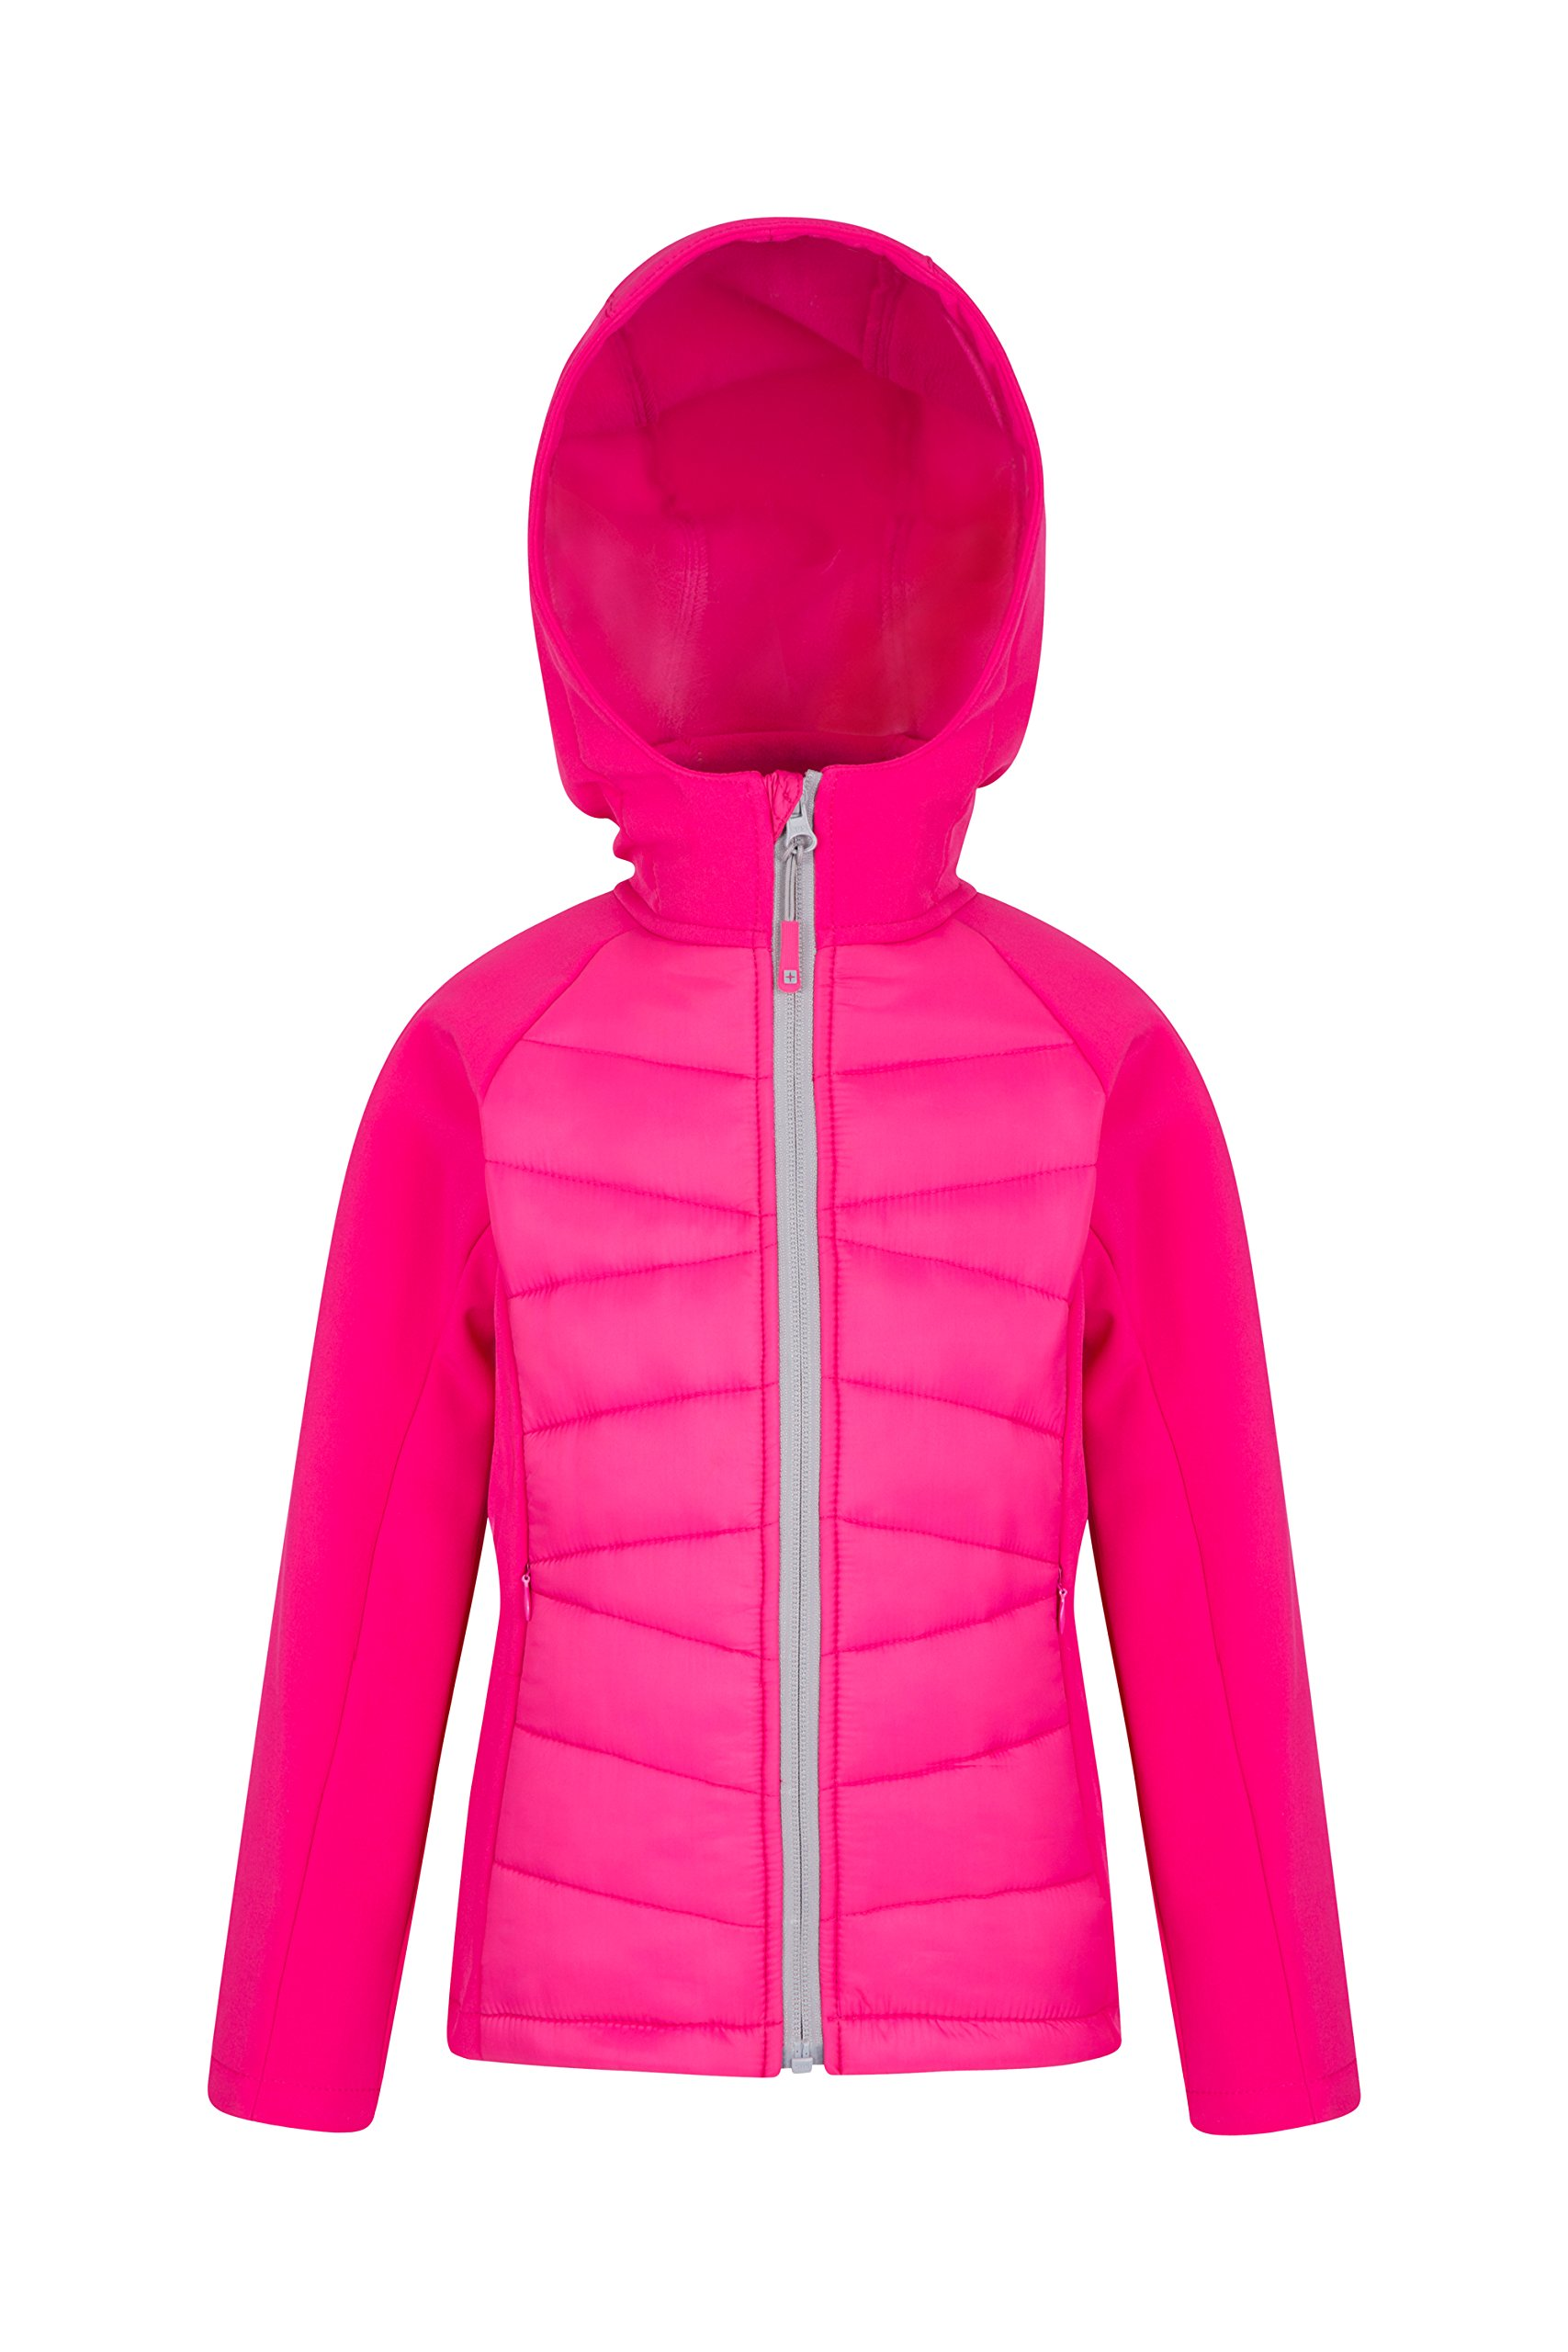 Mountain Warehouse Flexy Kids Padded Jacket - Childrens Summer Coat Pink 7-8 Years